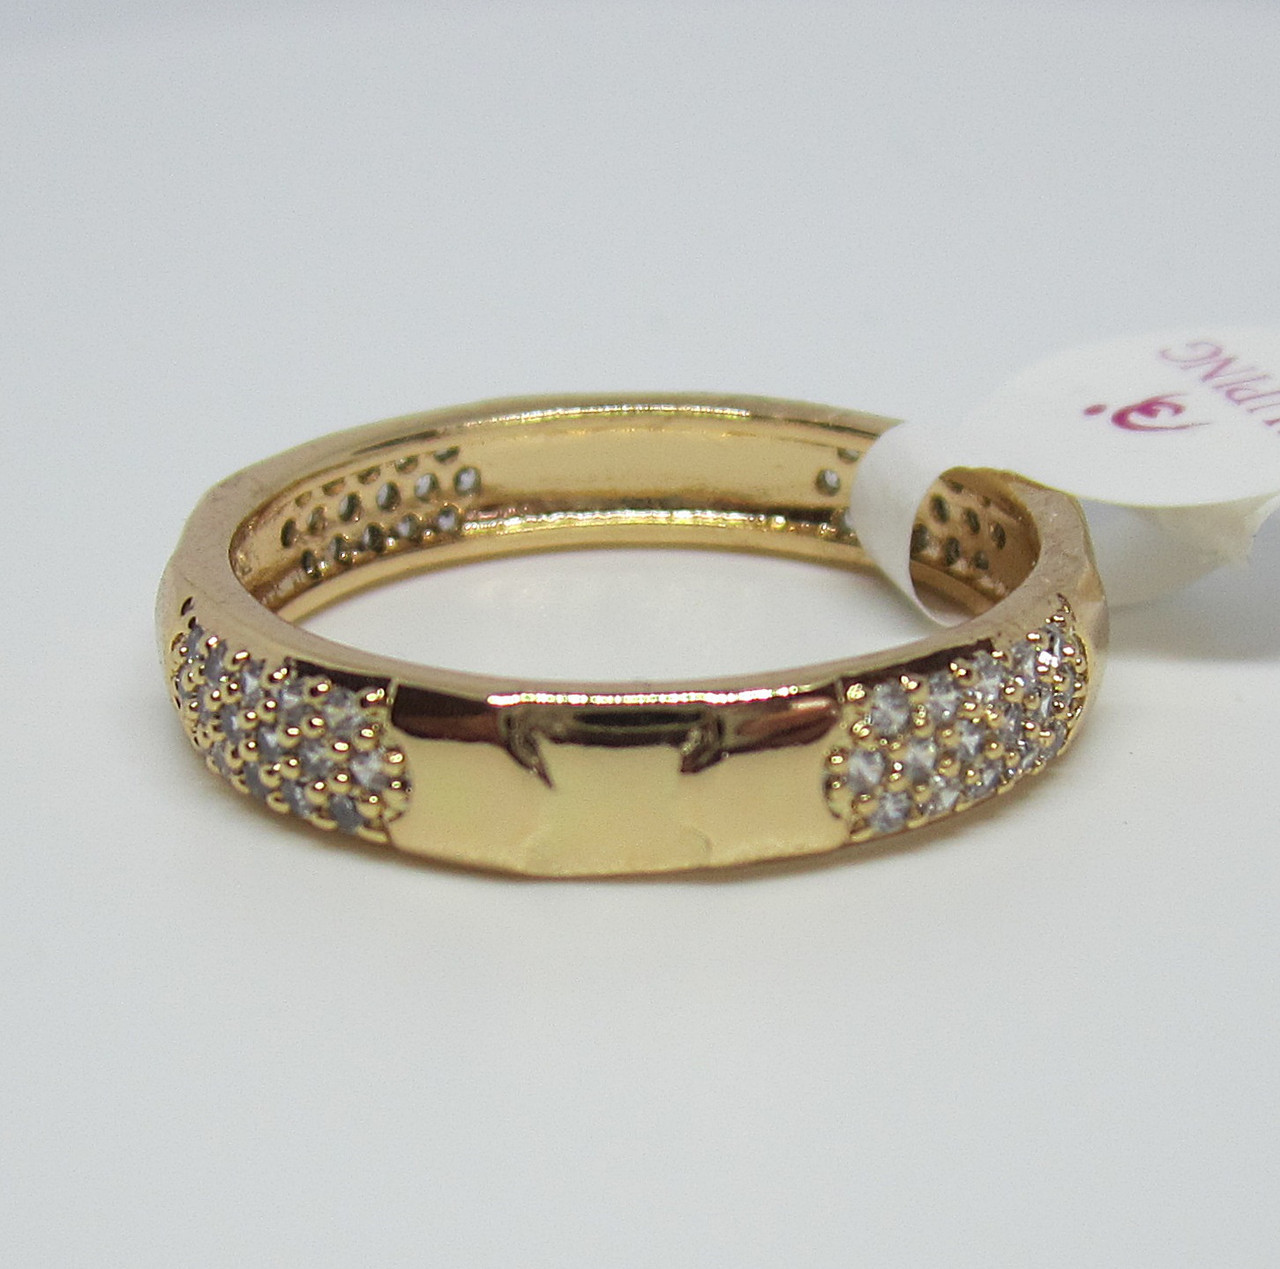 Кольцо XP Алиса, камни по кругу, размер 19, 20